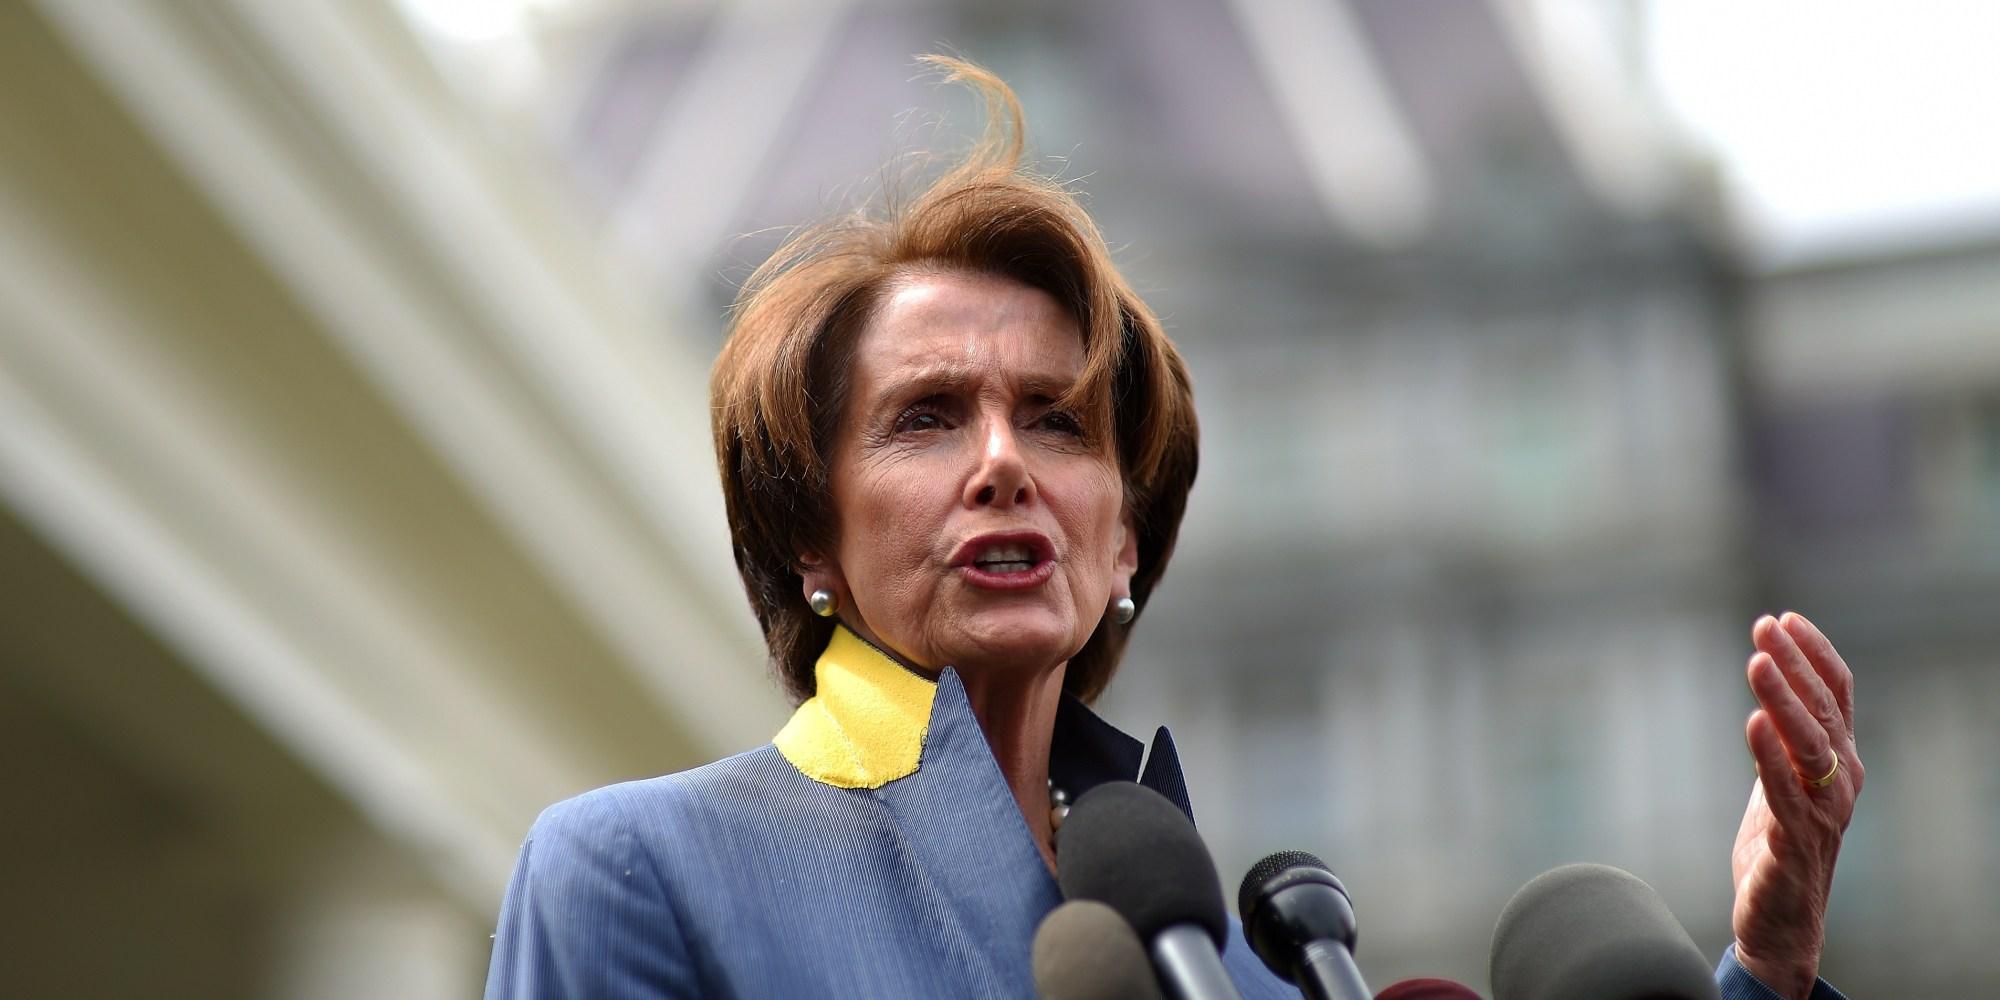 Nancy pelosi options trading